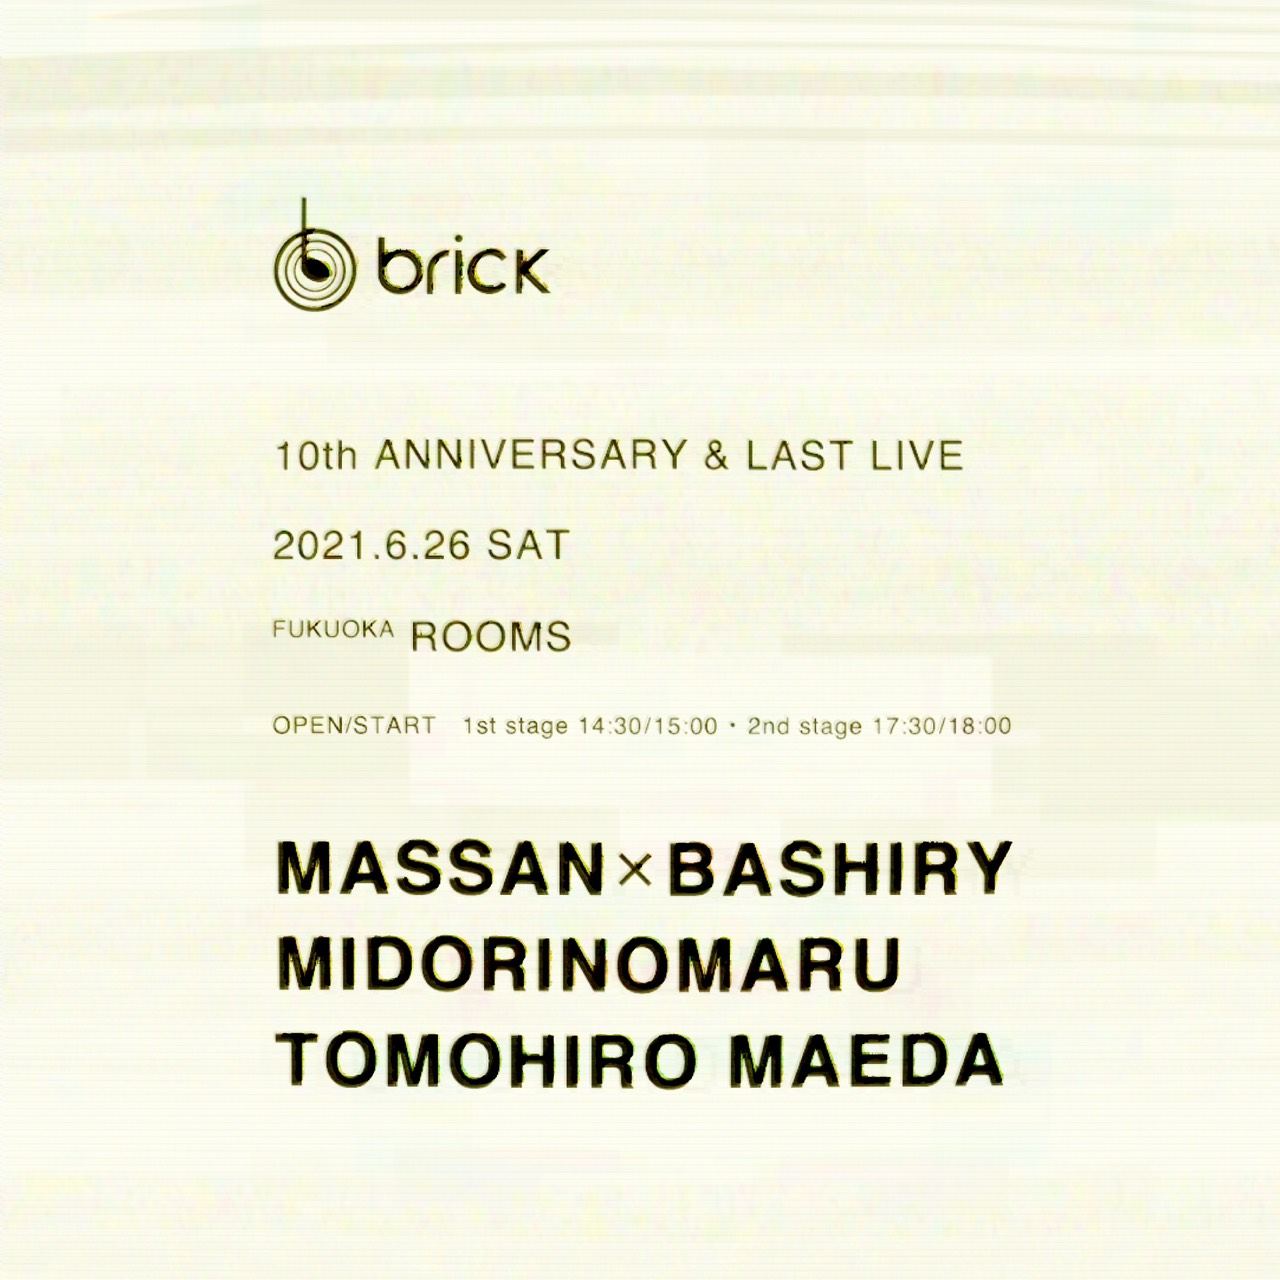 brick 10TH ANNIVERSARY LIVE[ 1st stage ]